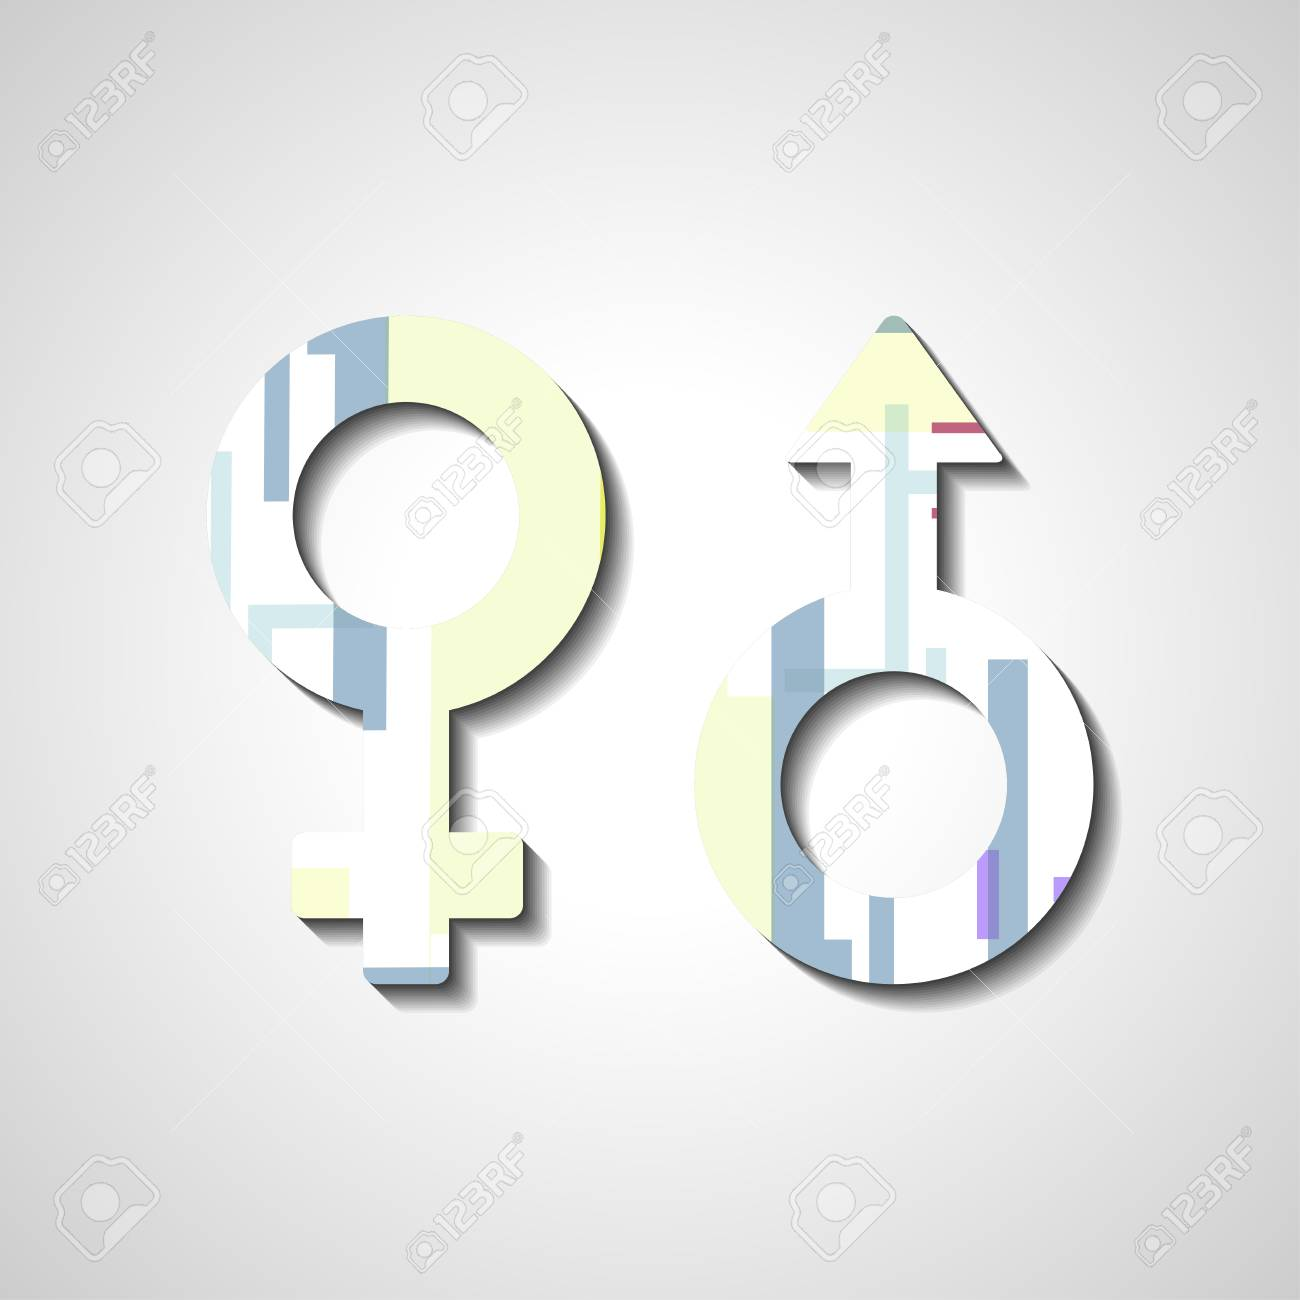 Male And Female Gender Symbols Royalty Fri Clipart Vektorer Och